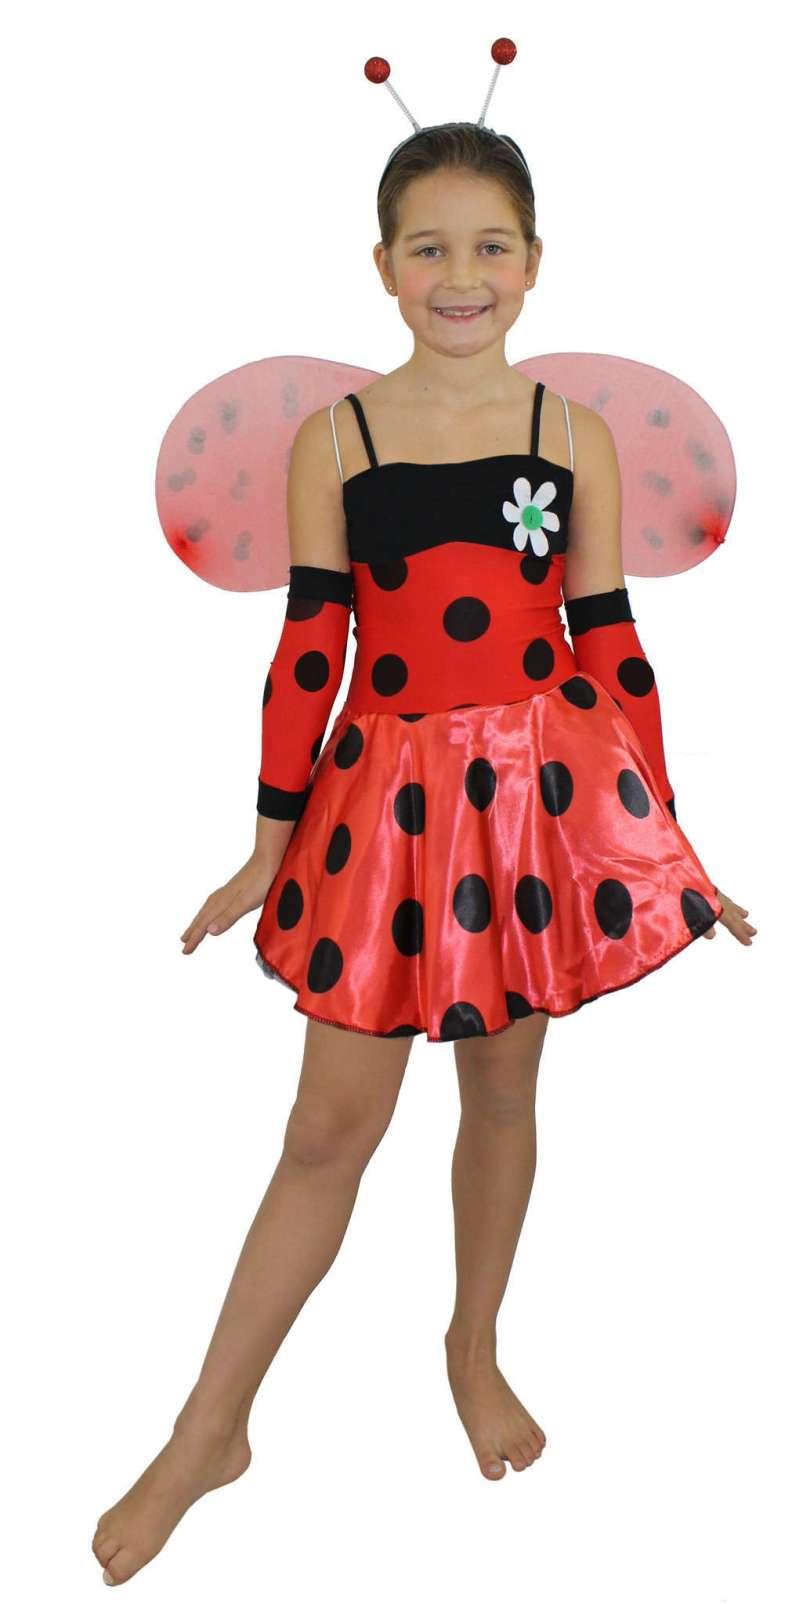 Girls Lady Bug Costume at ILoveFancyDress.com